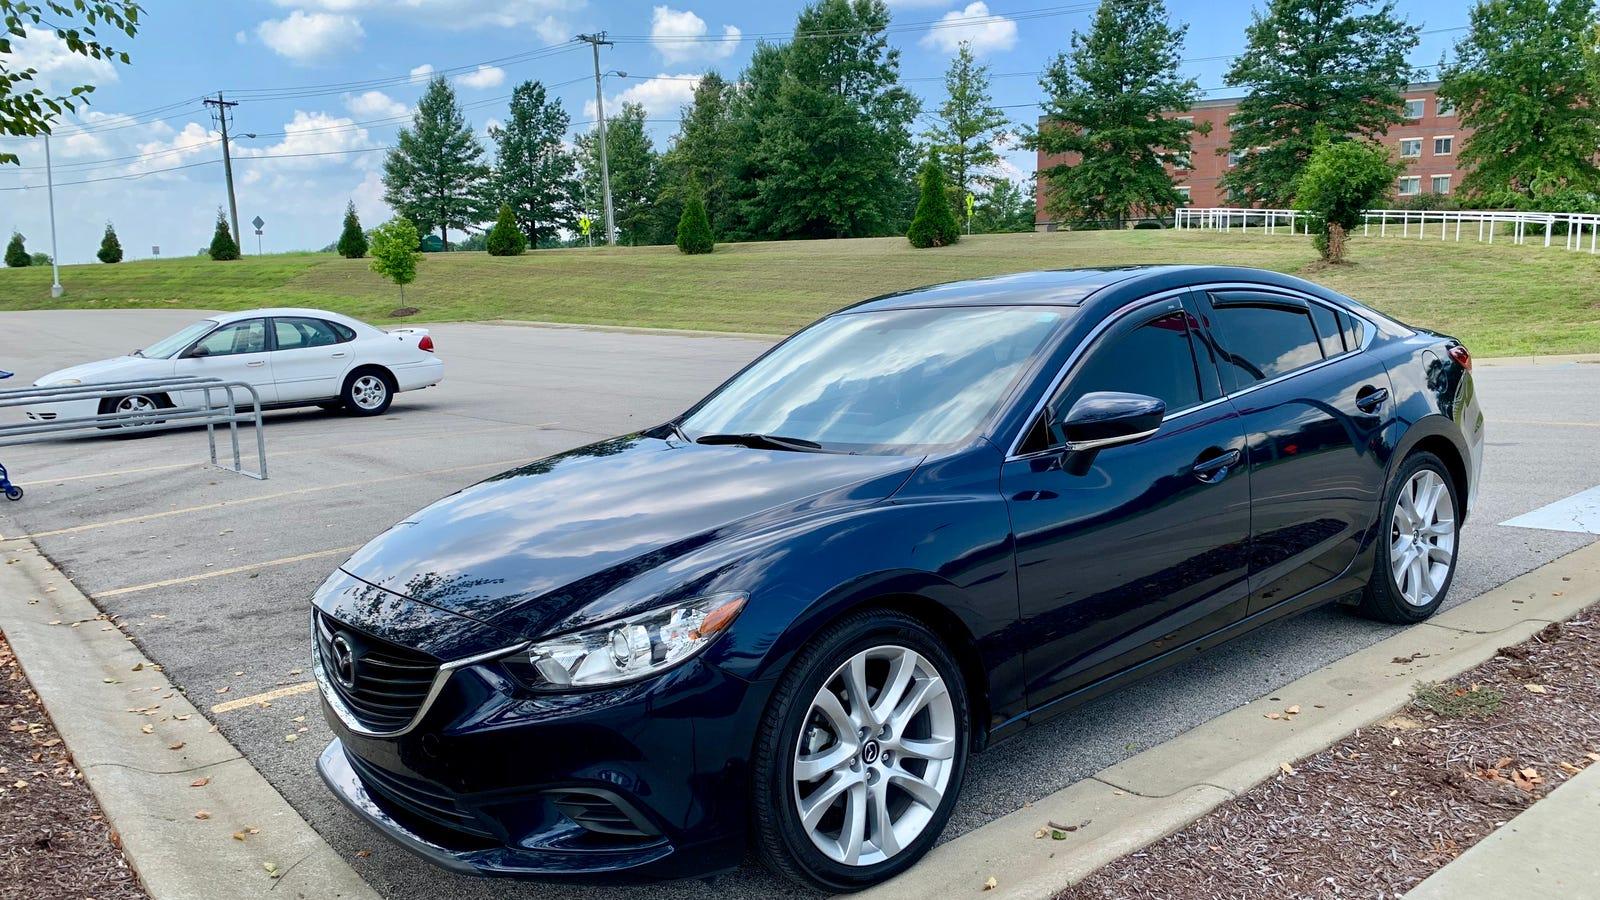 New Mazda6 brakes: The miniseries.